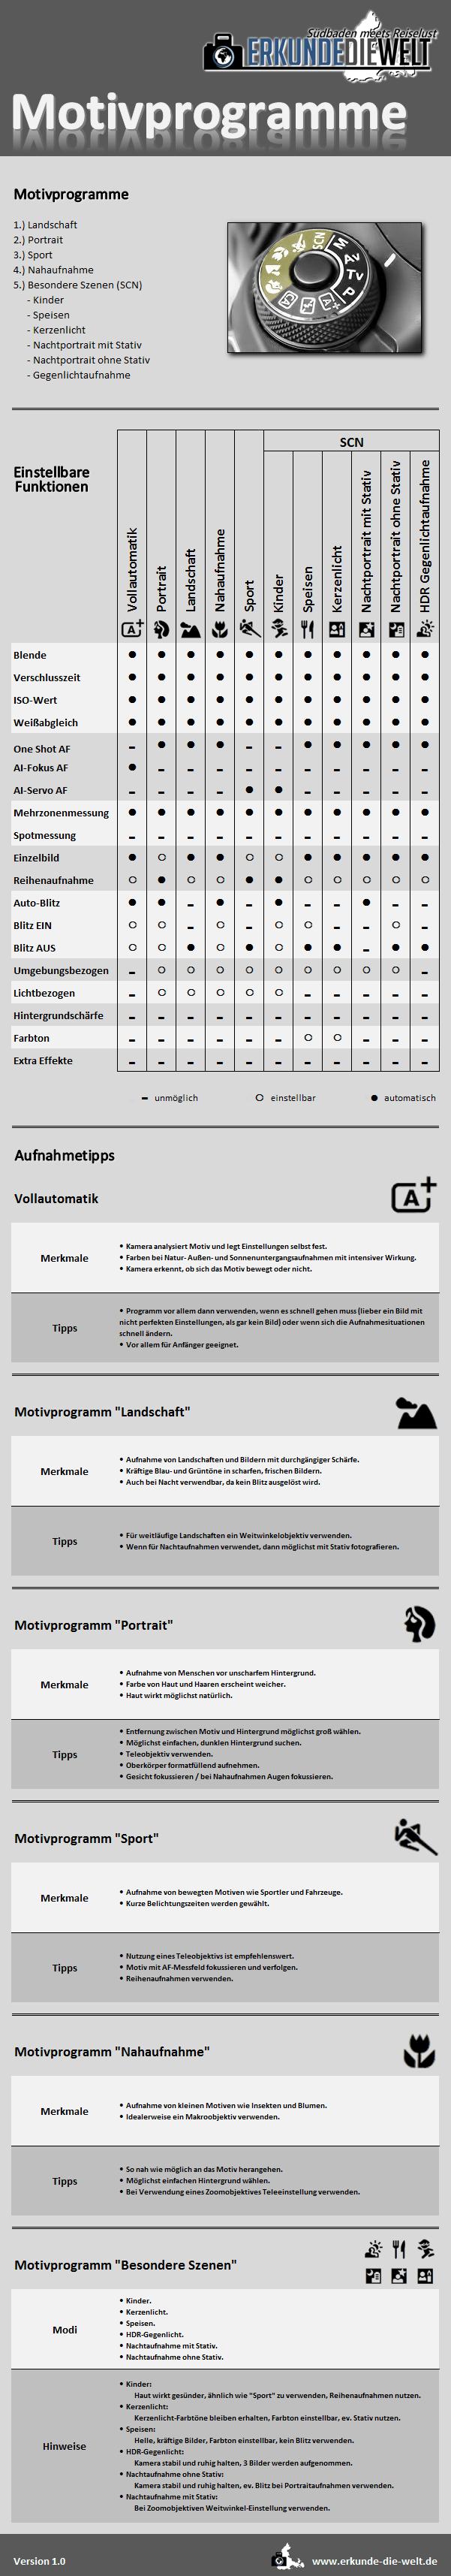 canon-motivprogramme-tipps-edw